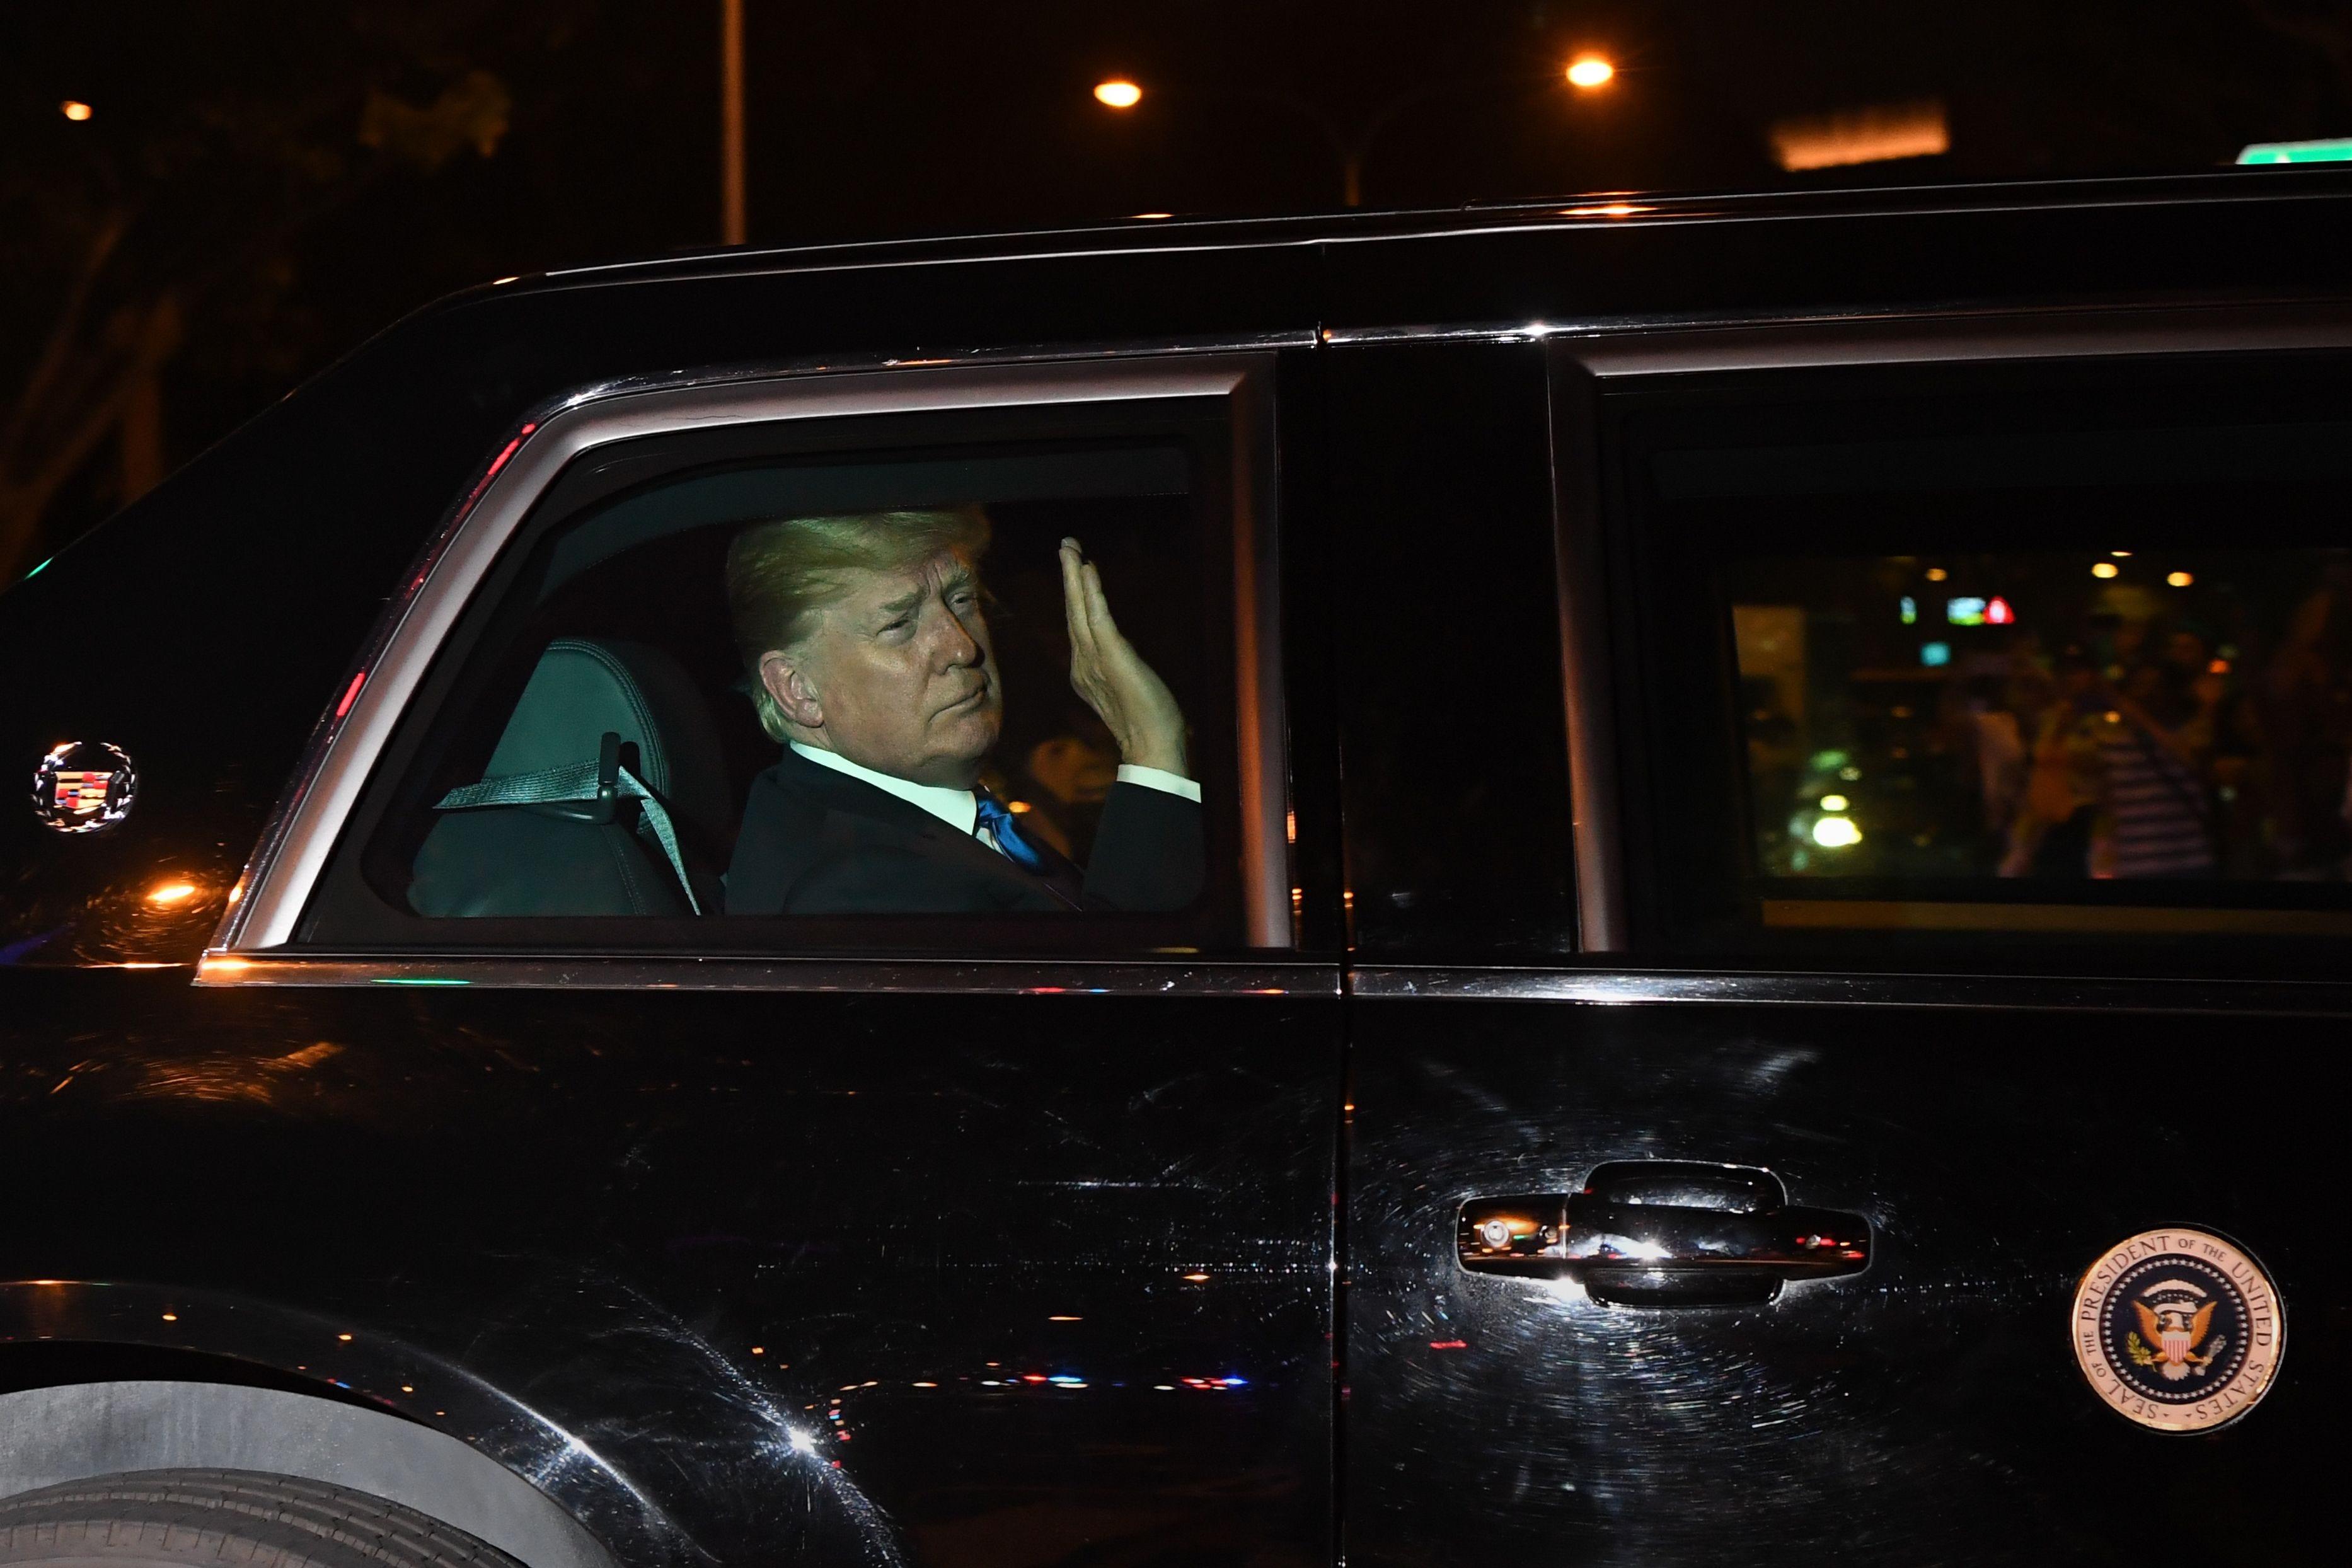 Donald Trump, Kim Jong Un arrive in Singapore for nuclear summit